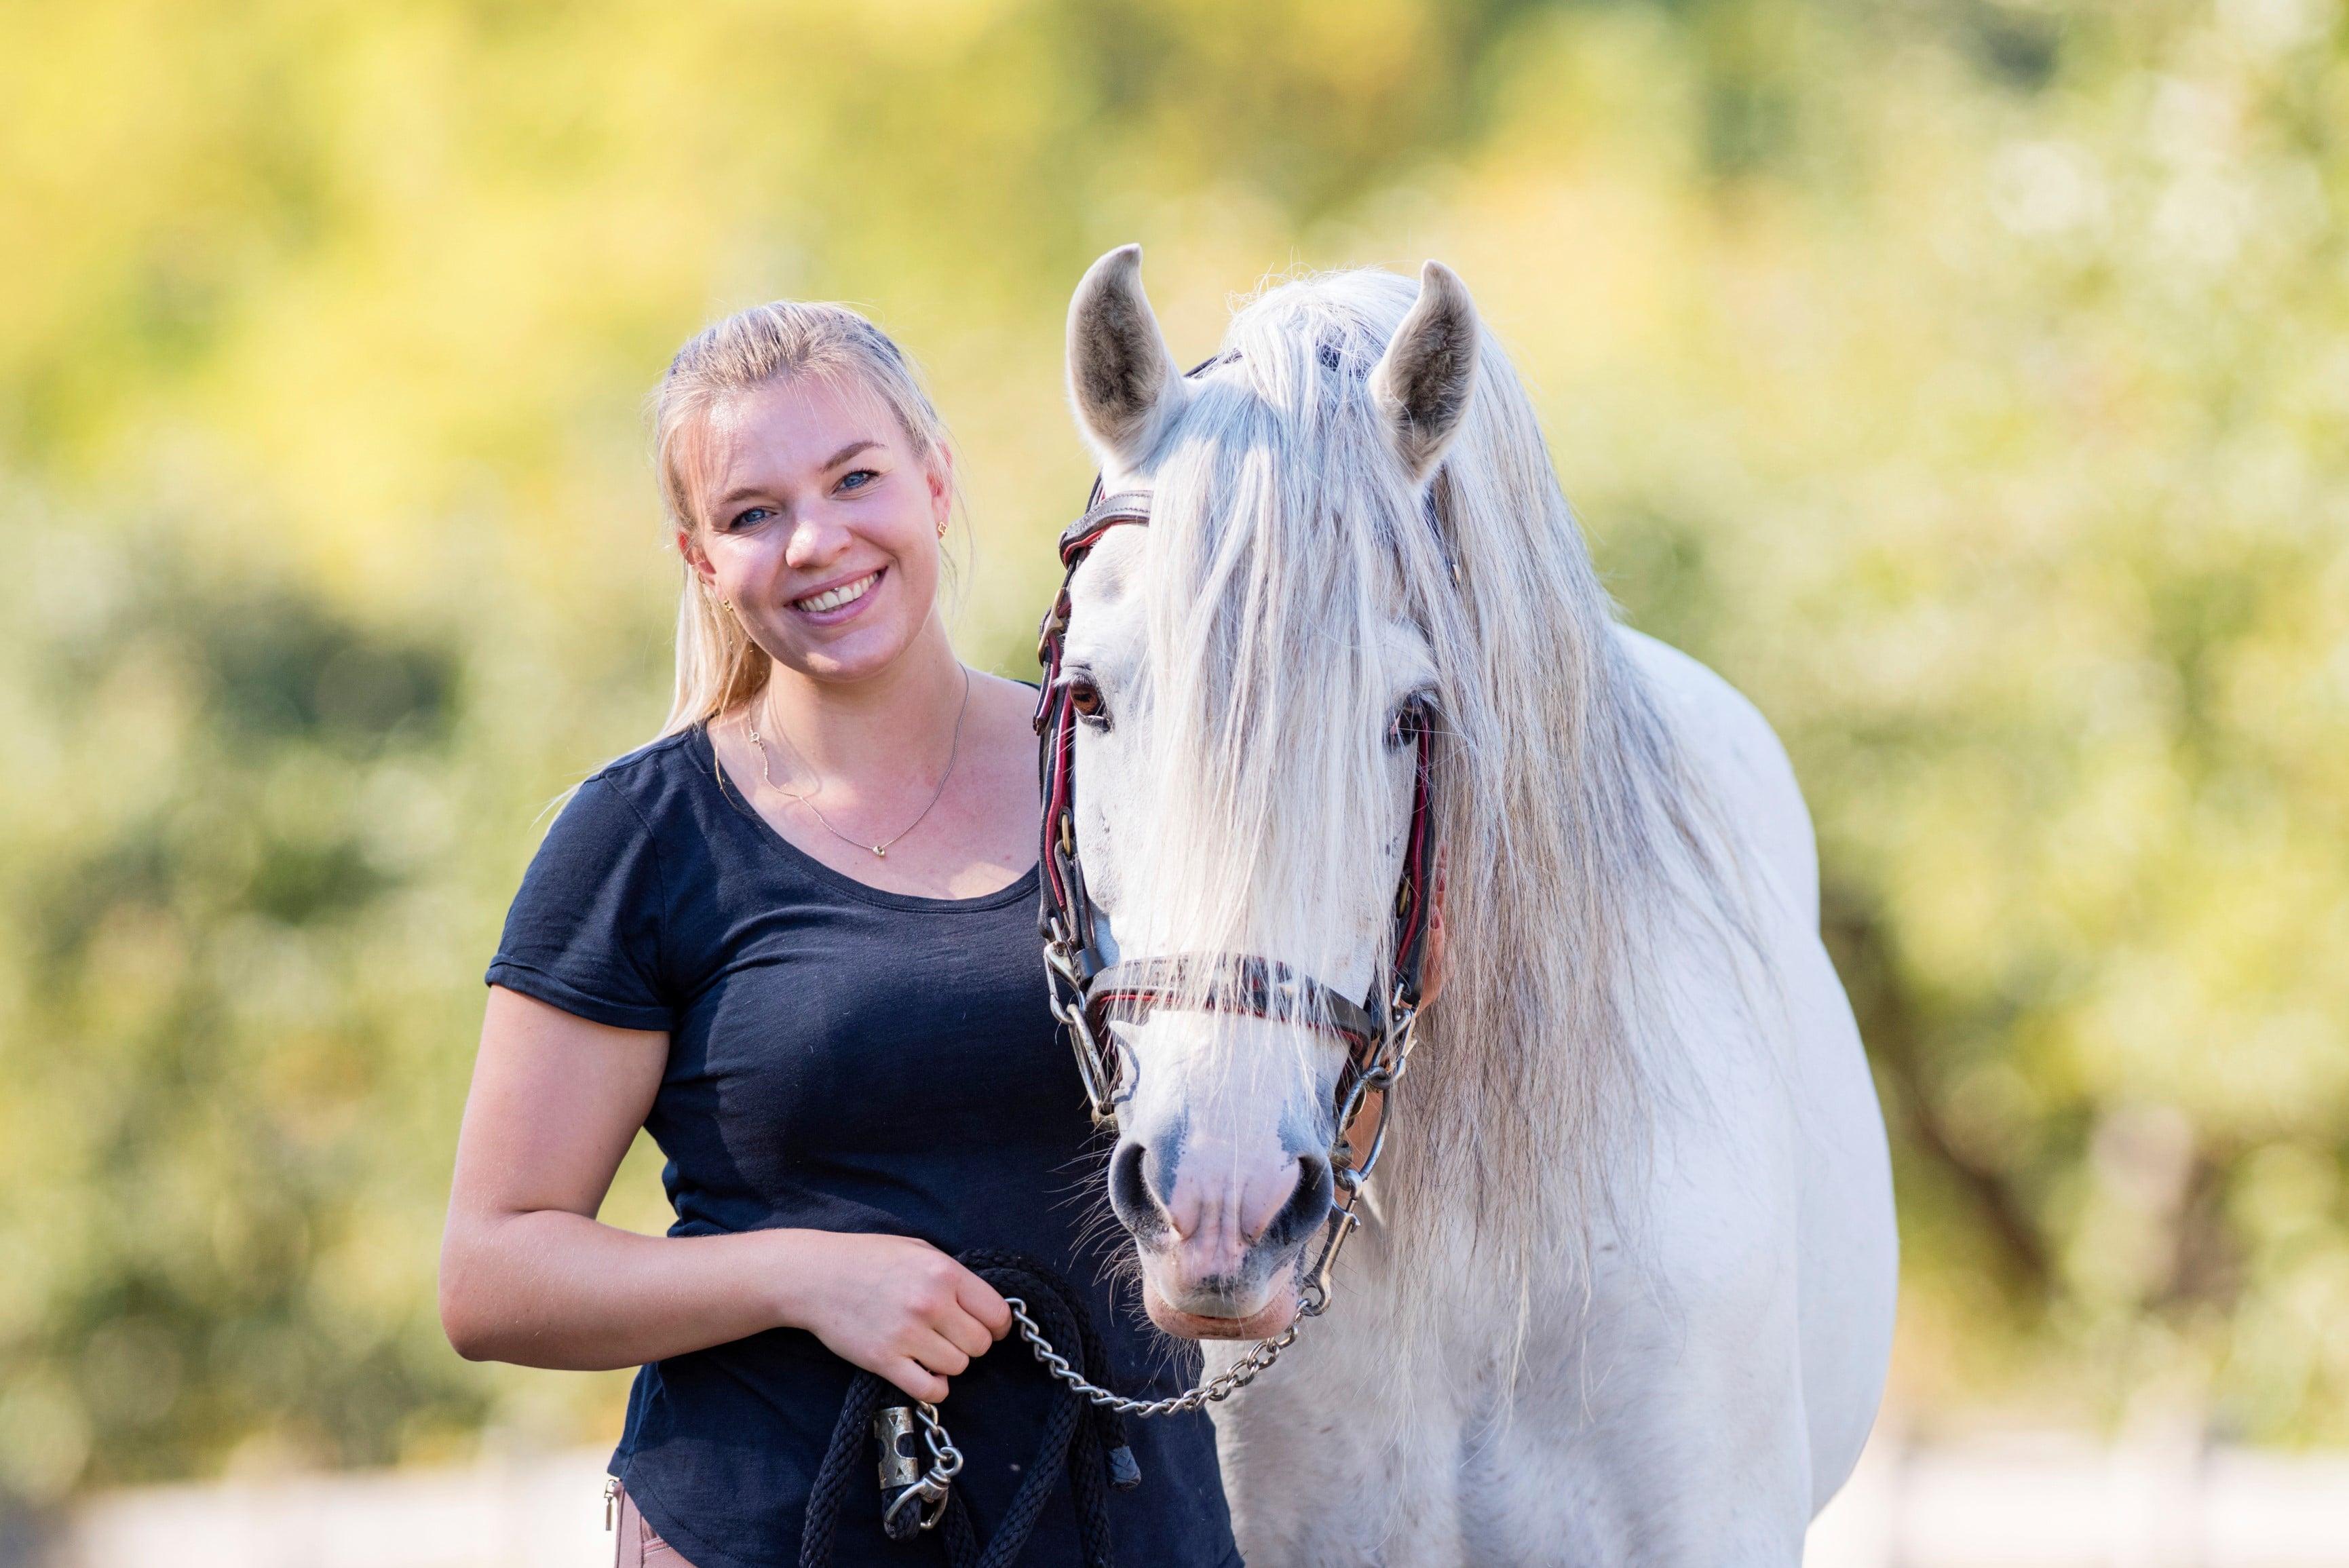 Luzi und Vasco - das Pferd